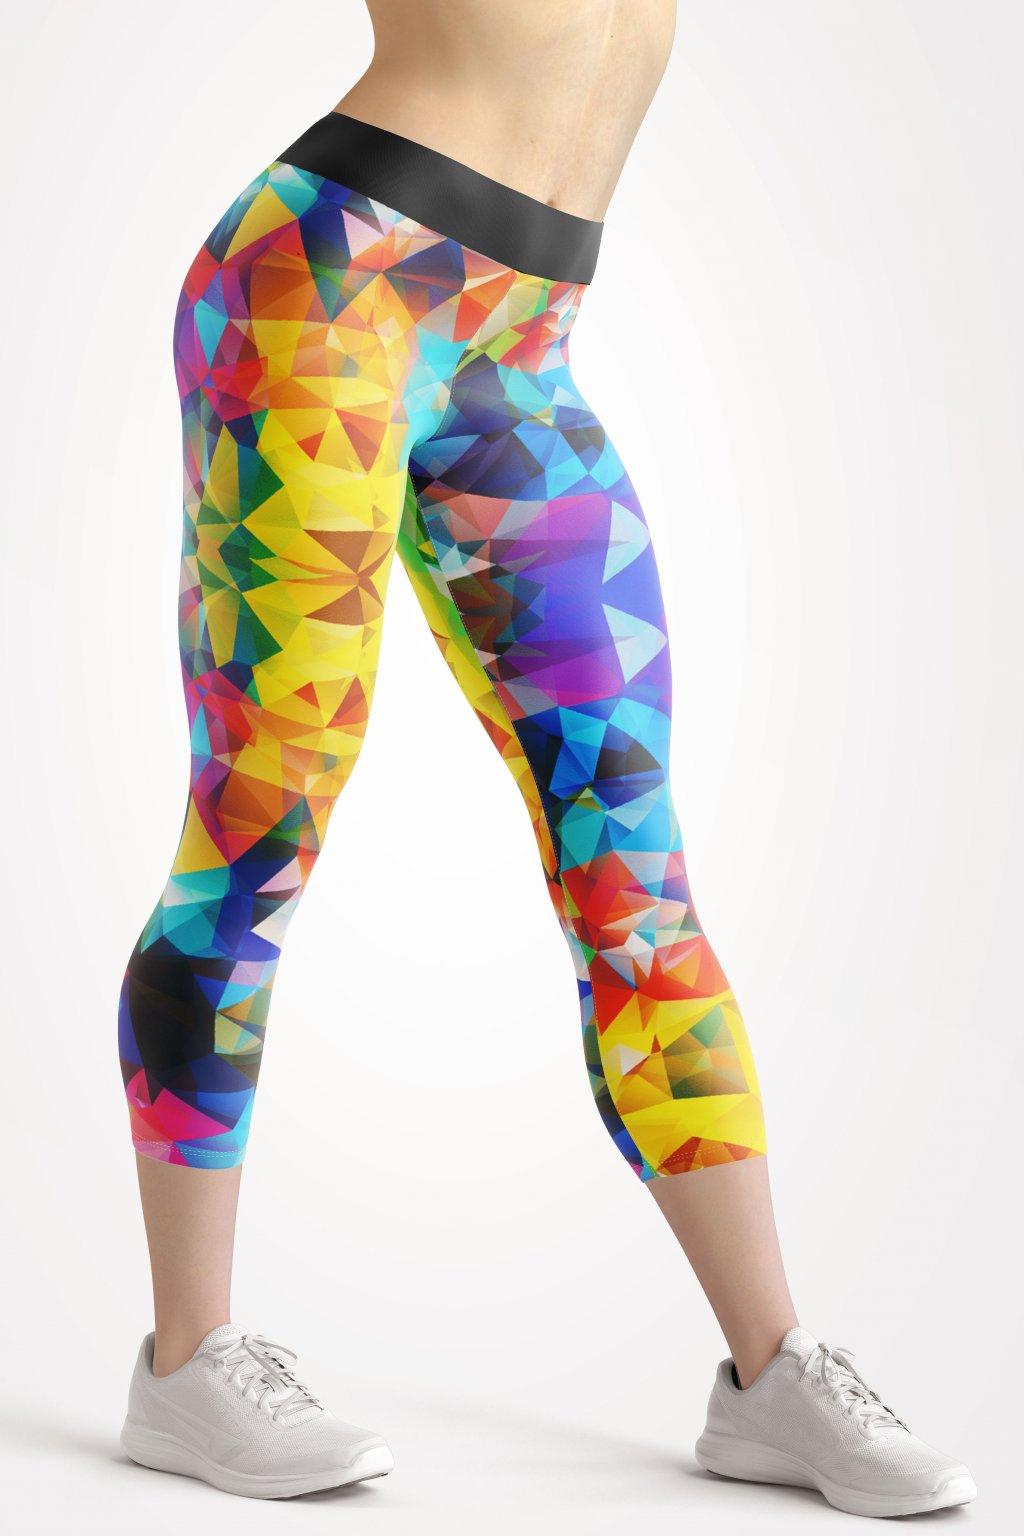 mystique 3 4 leggings front by utopy